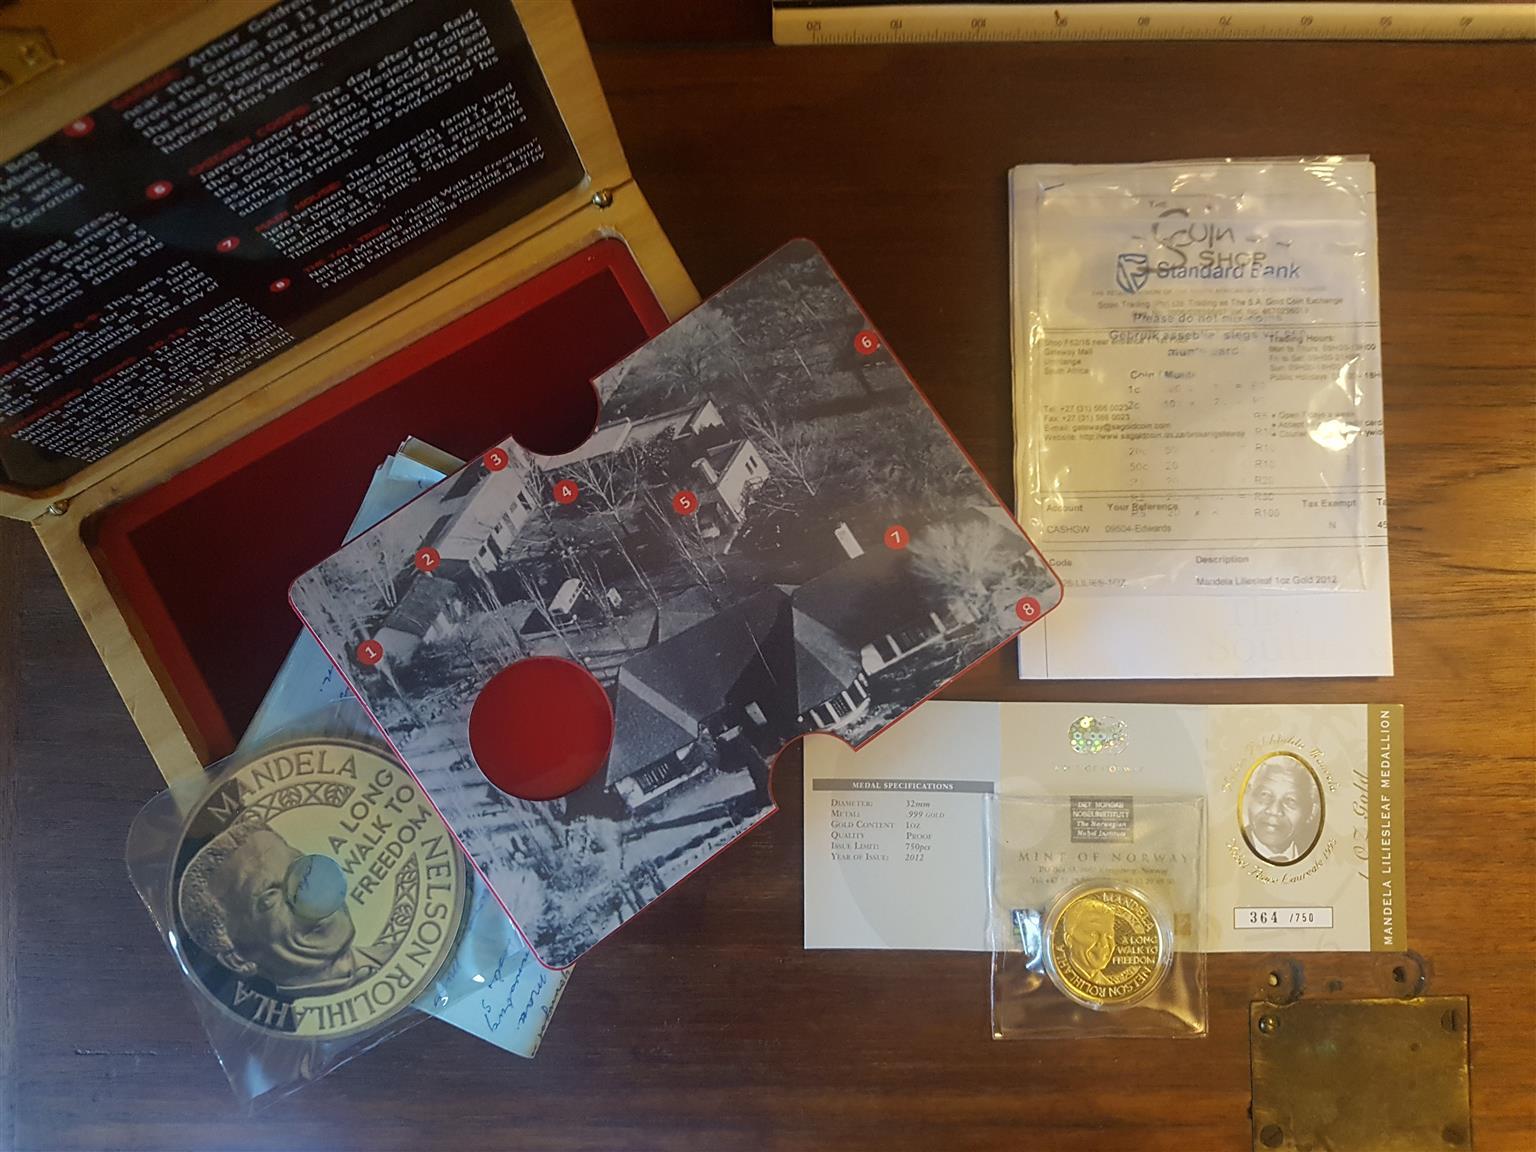 Nelson Mandela Liliesleaf 1oz Gold Coin 750 mint | Junk Mail